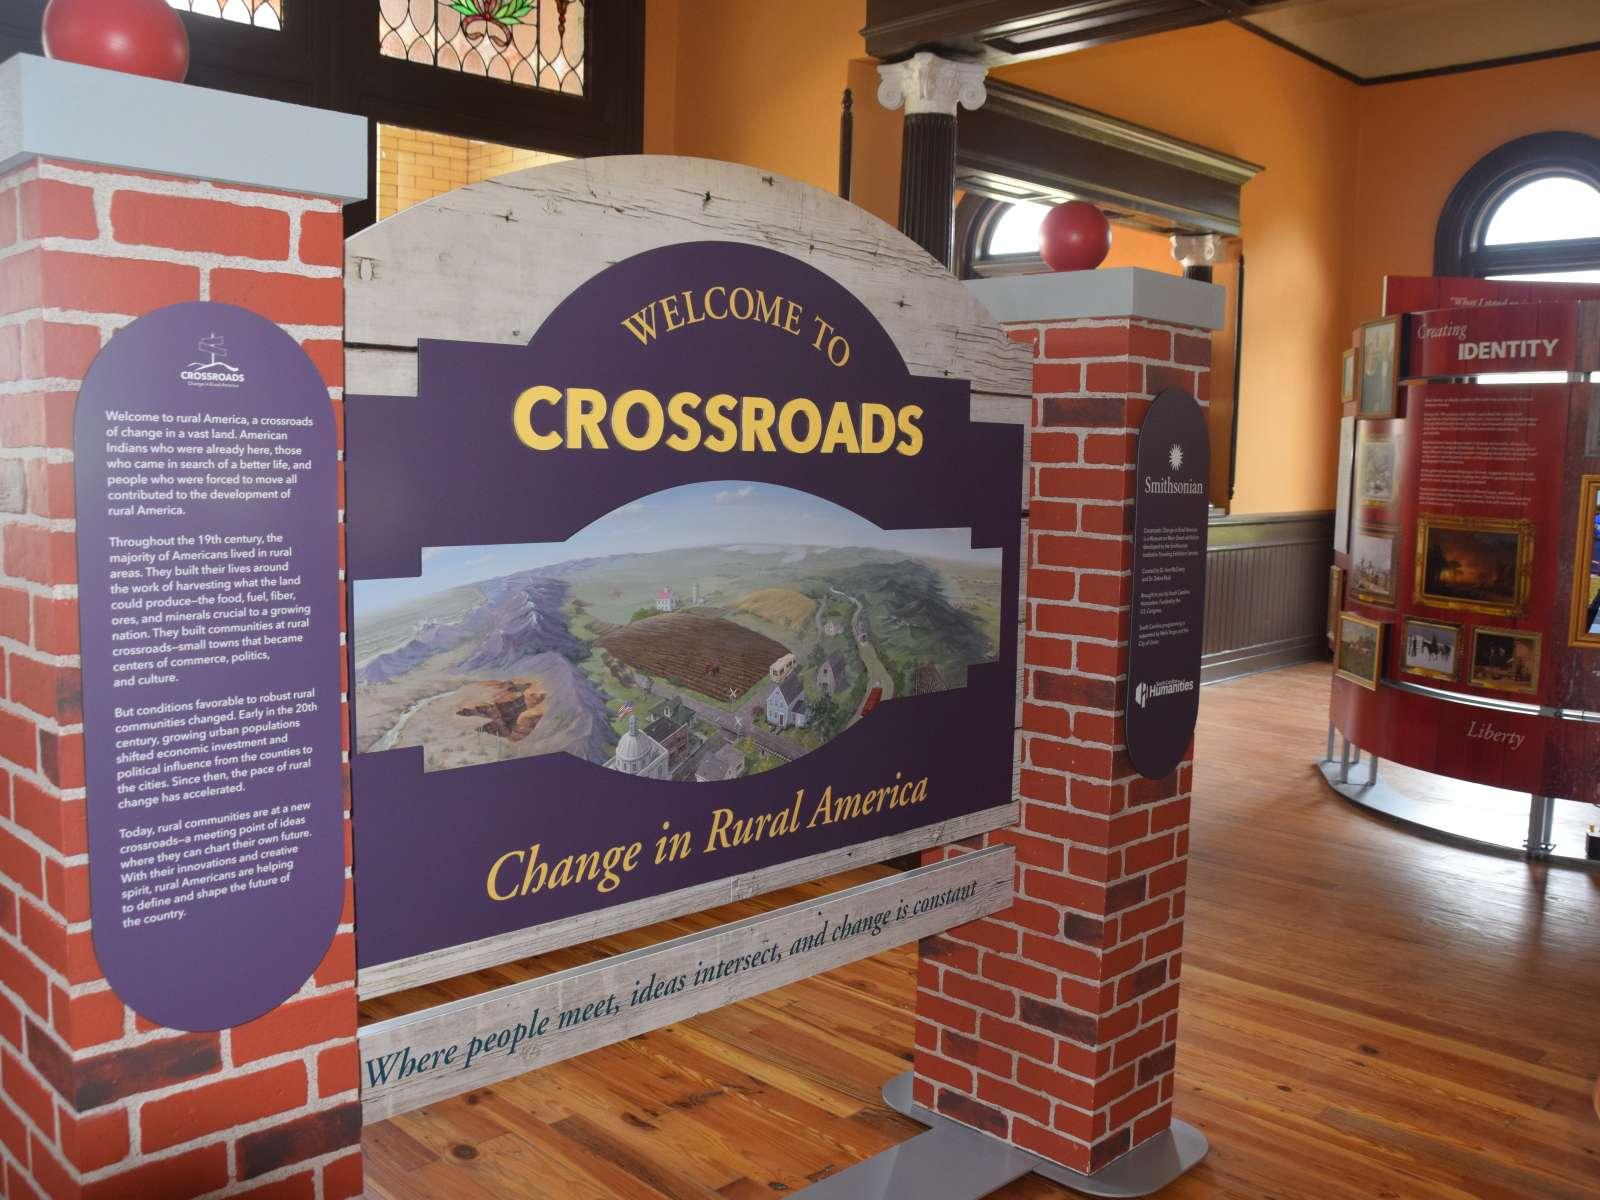 Crossroads installation in Union, South Carolina in 2018